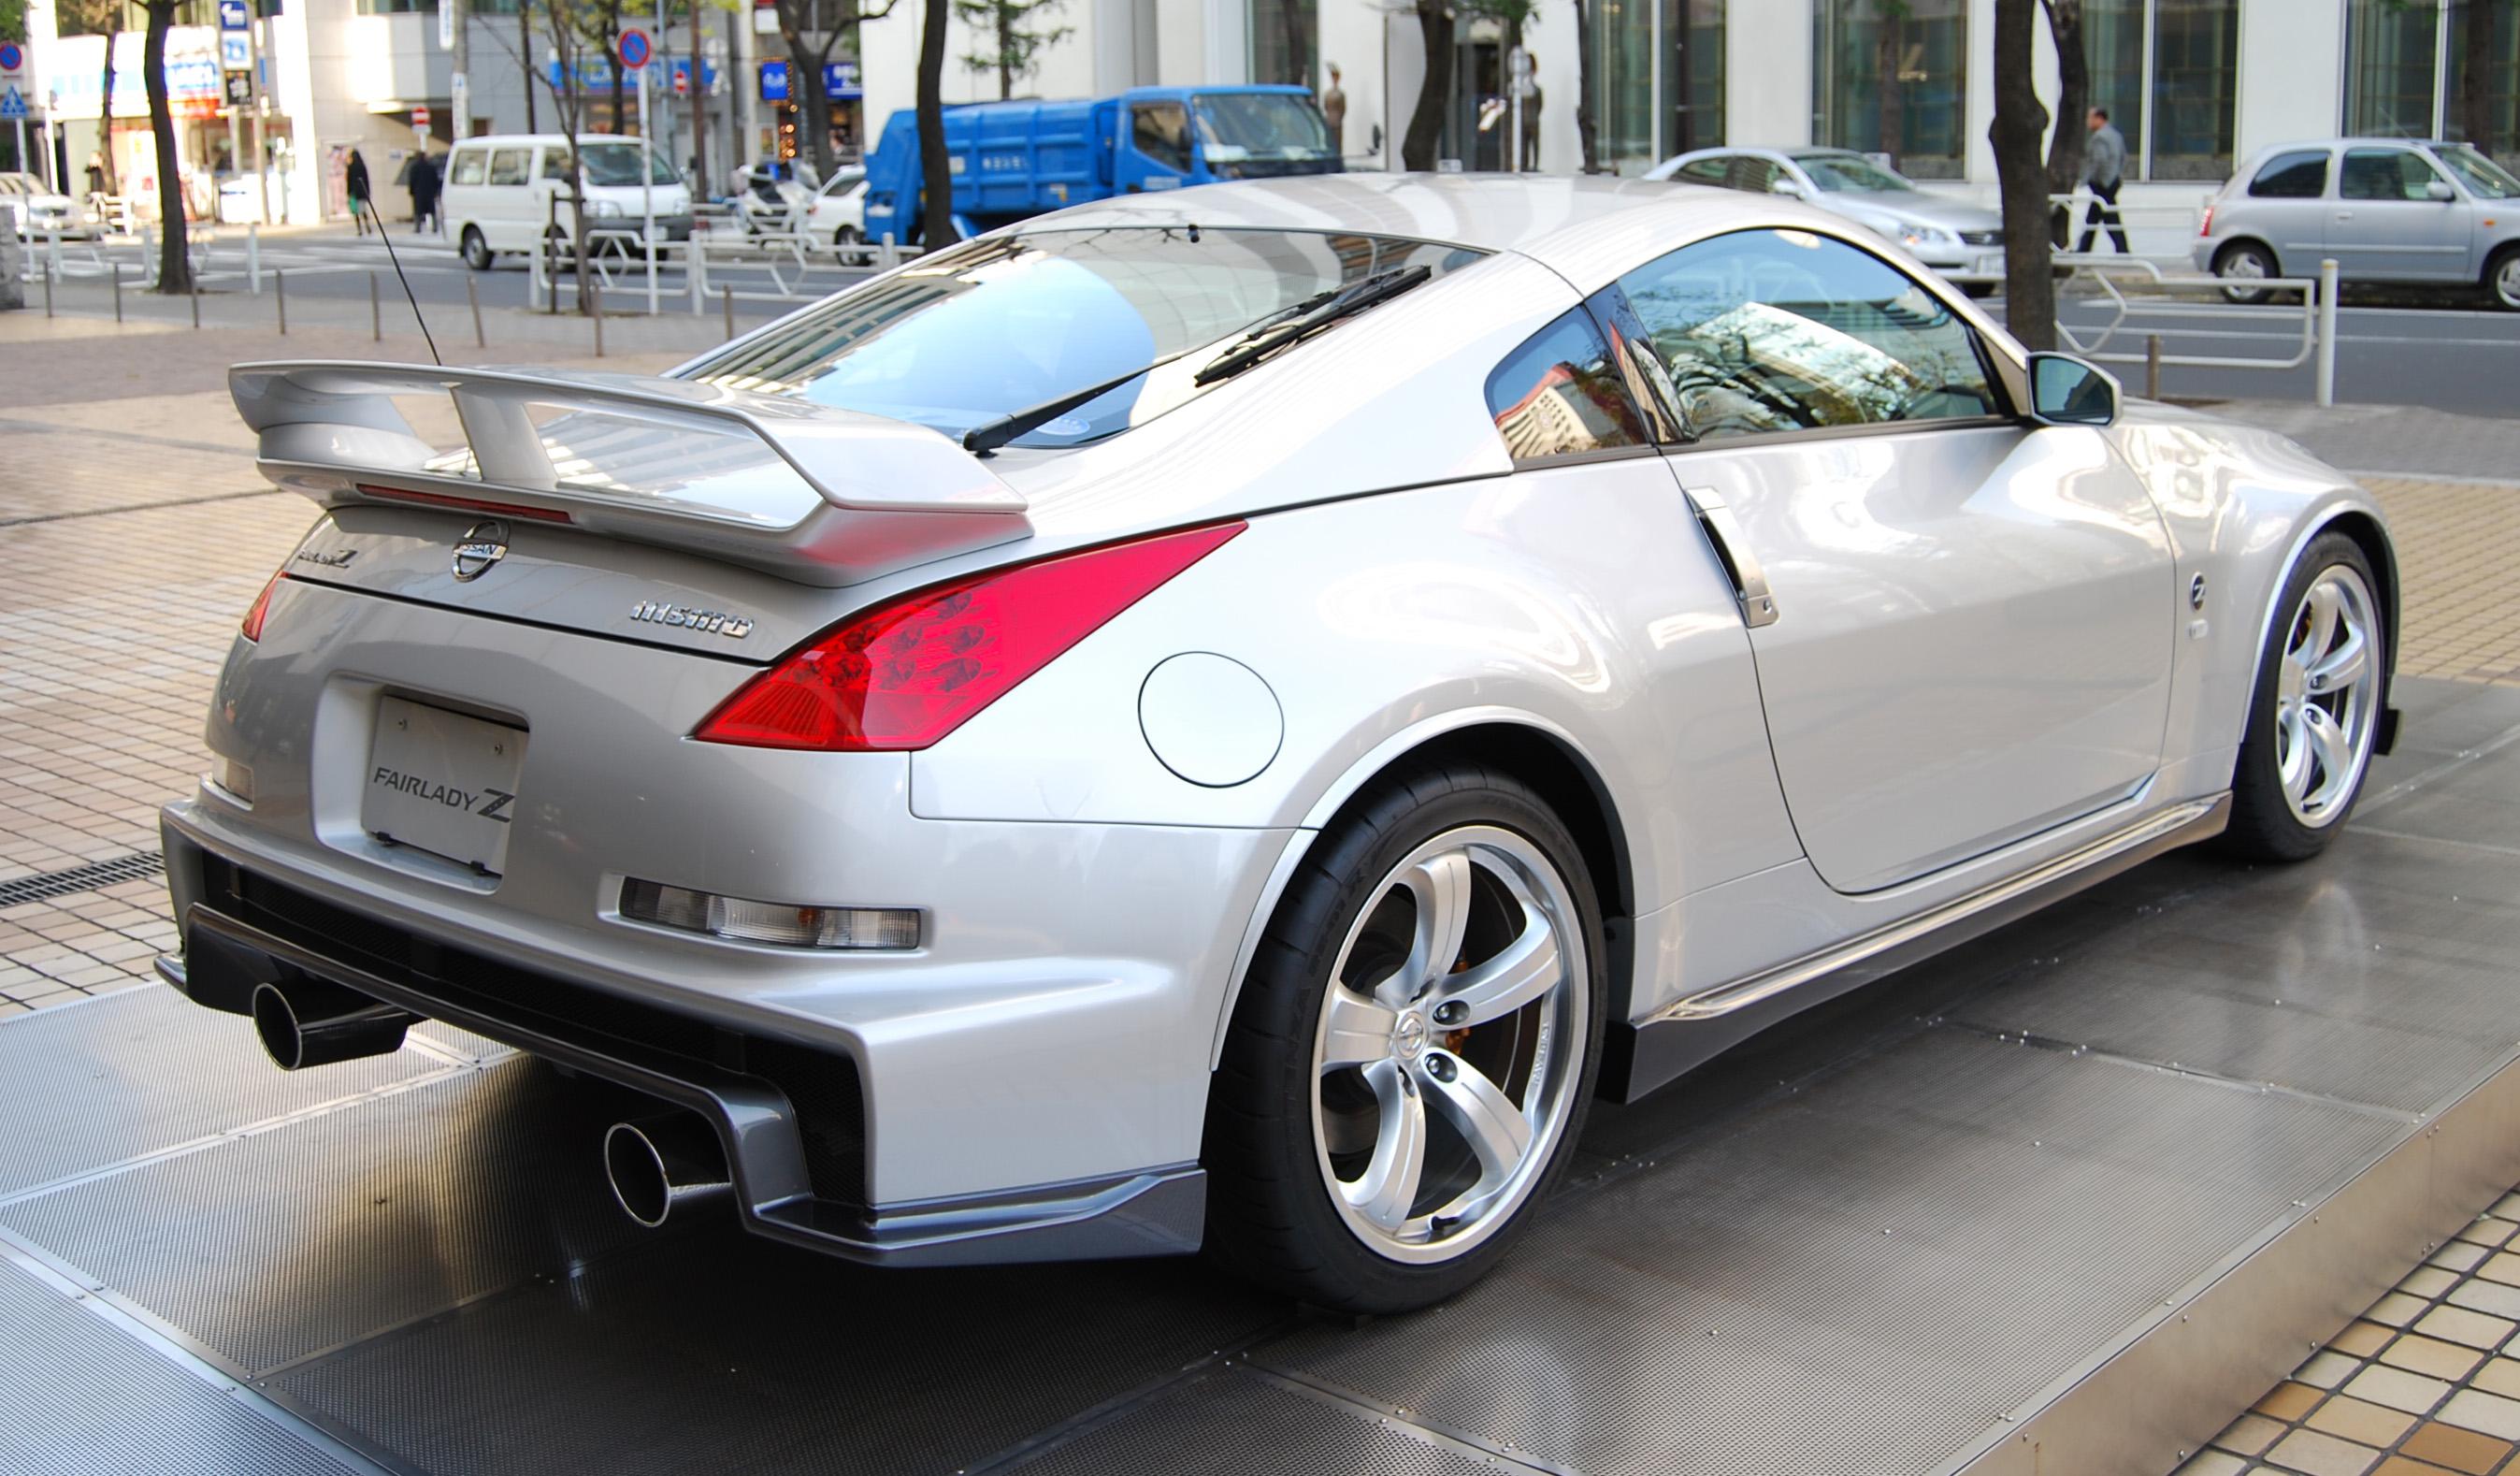 Nissan Fairlady Z: История модели, фотогалерея и список модификаций